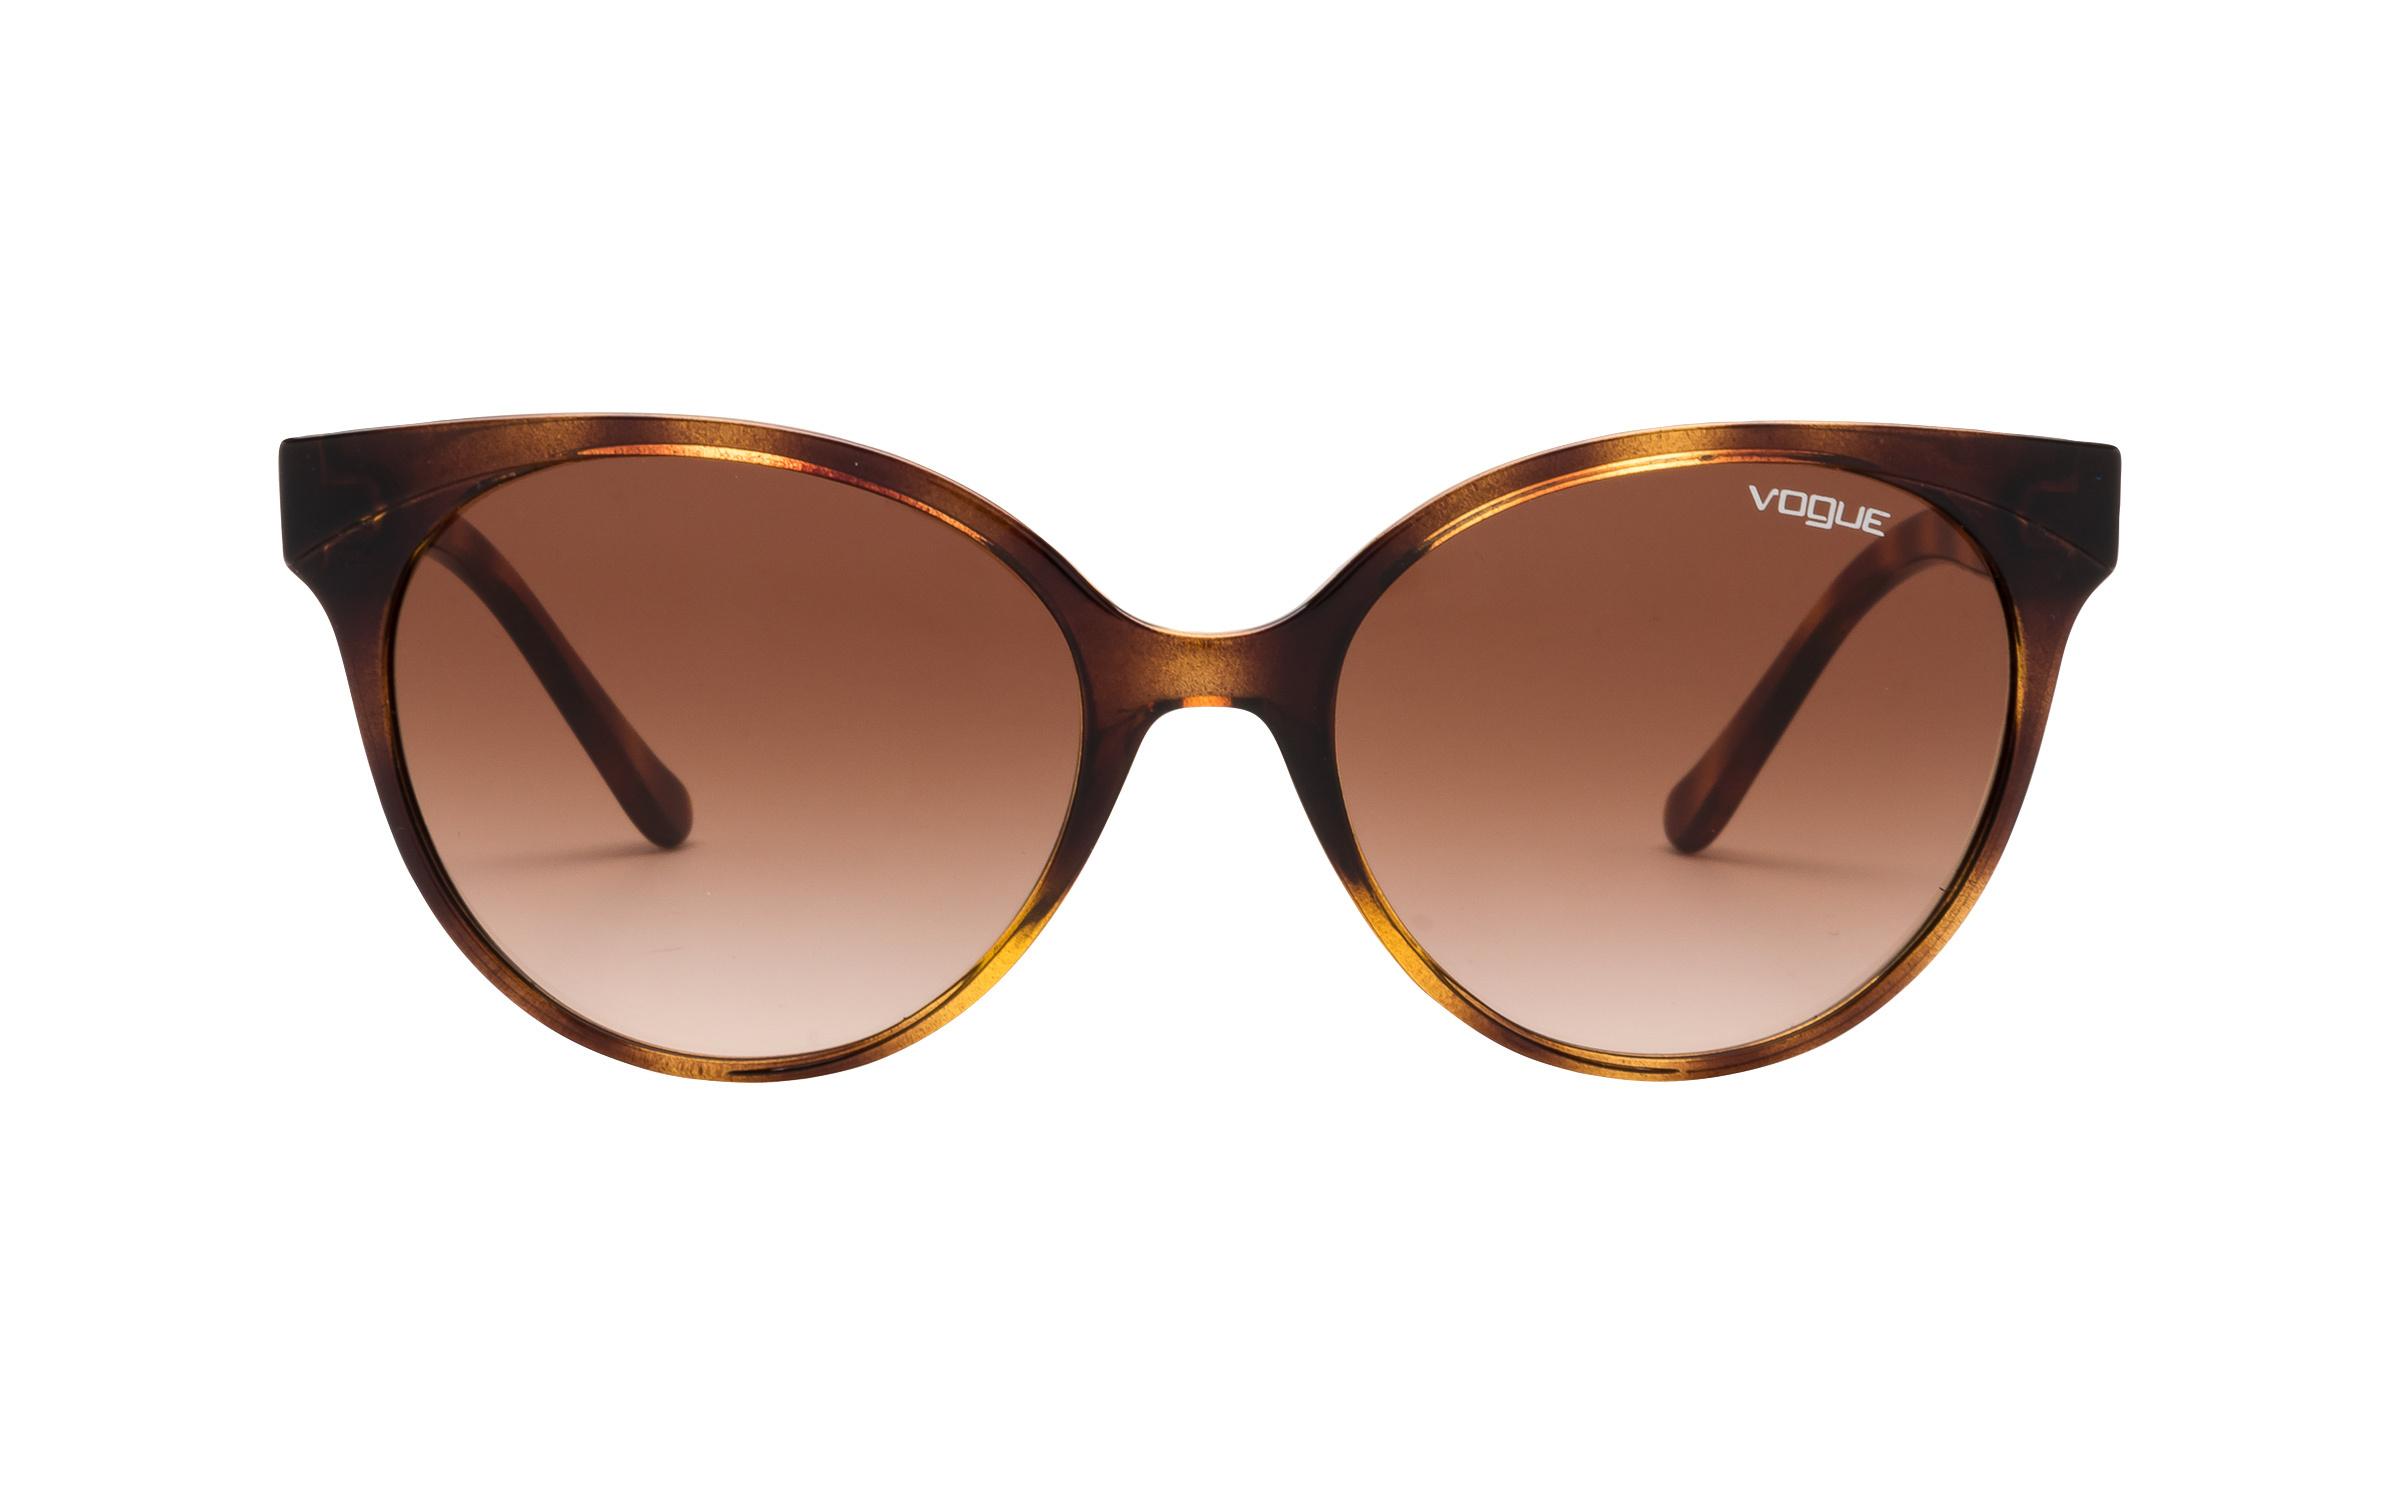 http://www.coastal.com/ - Luxottica Vogue VO5246-S W65613 53 Sunglasses in Dark Havana Tortoise | Acetate – Online Coastal